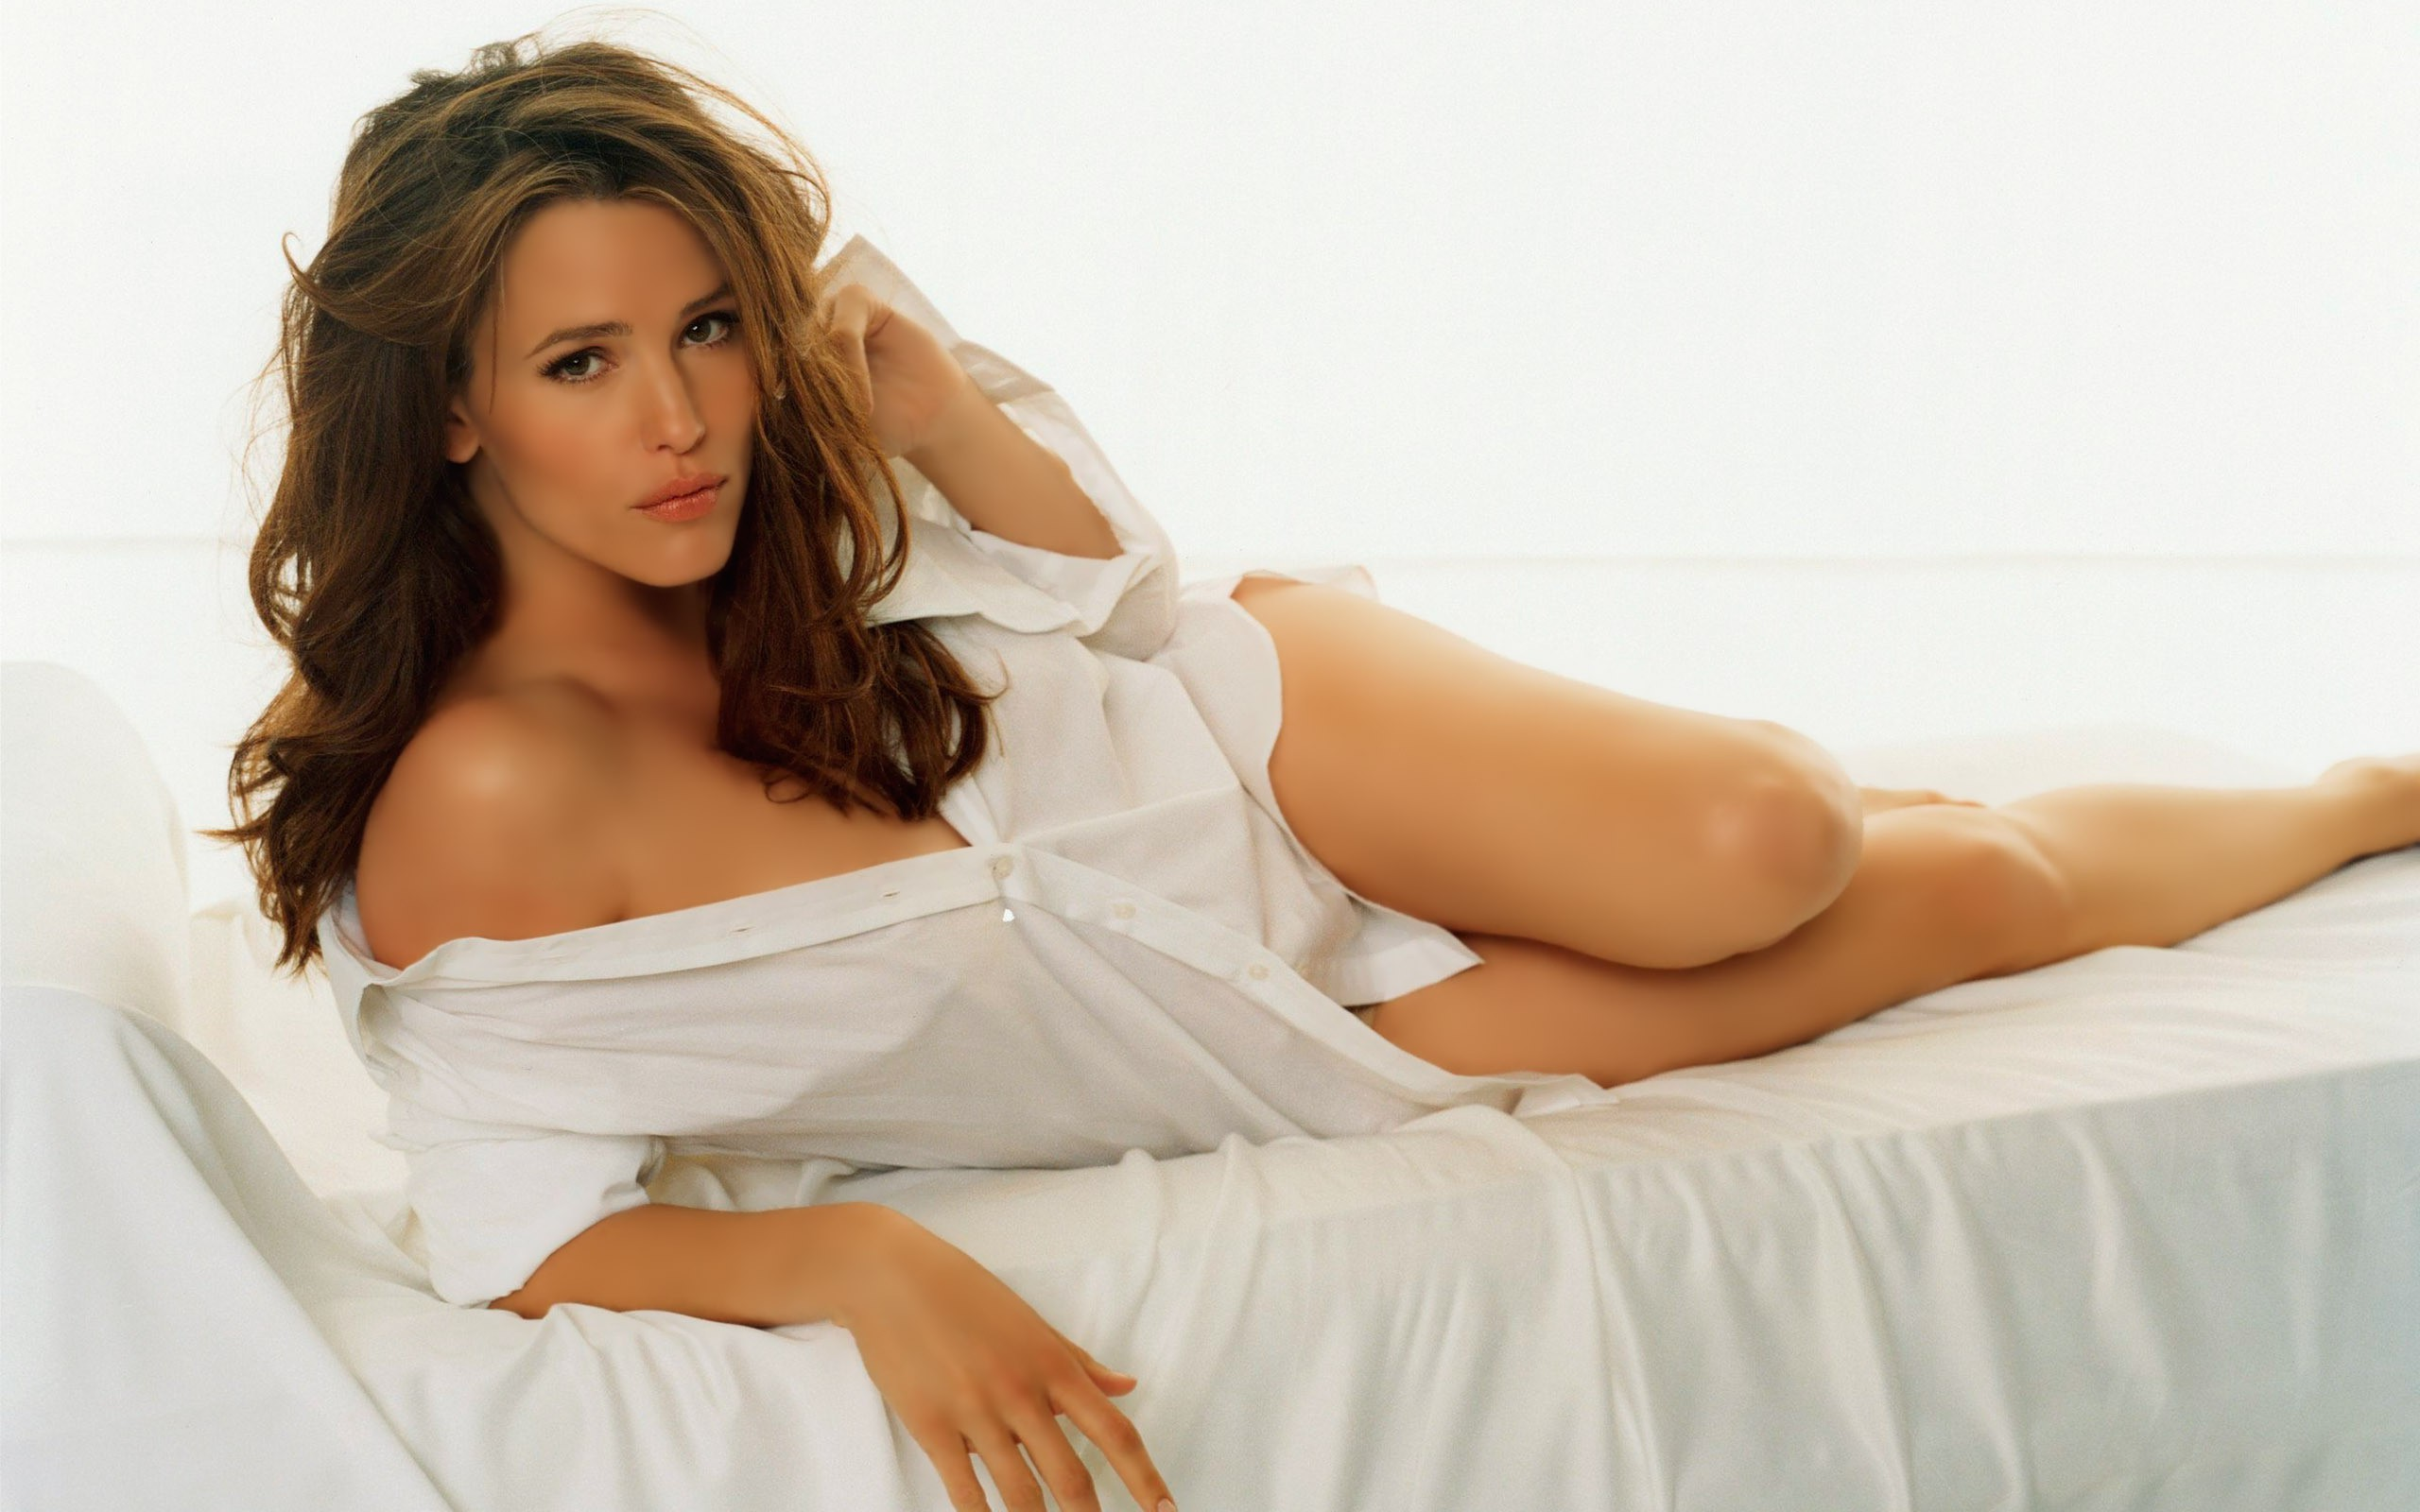 Jennifer Garner Hot HD Wallpapers - Hollywood Actress